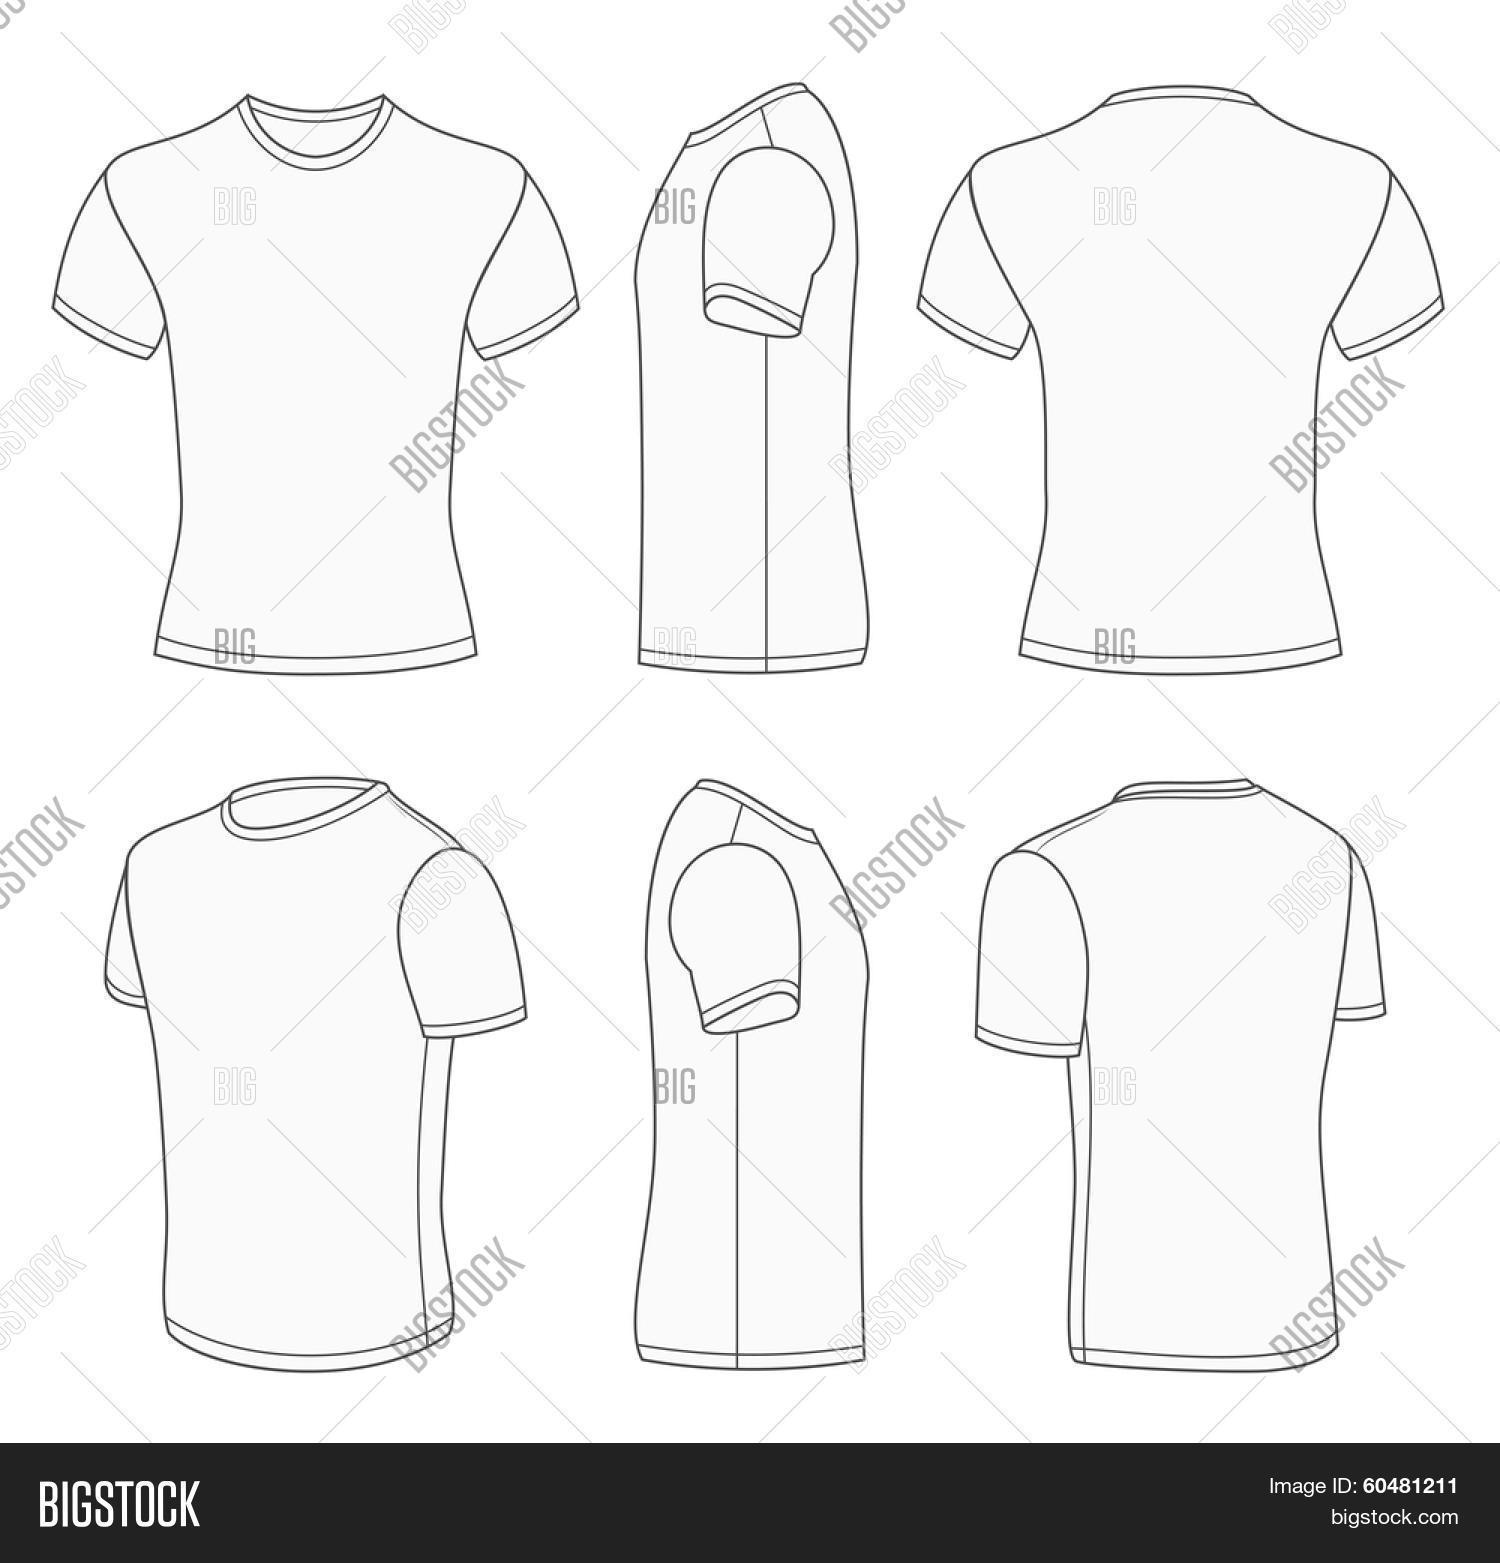 33da79a32 All views men's white short sleeve t-shirt design templates (front, back,